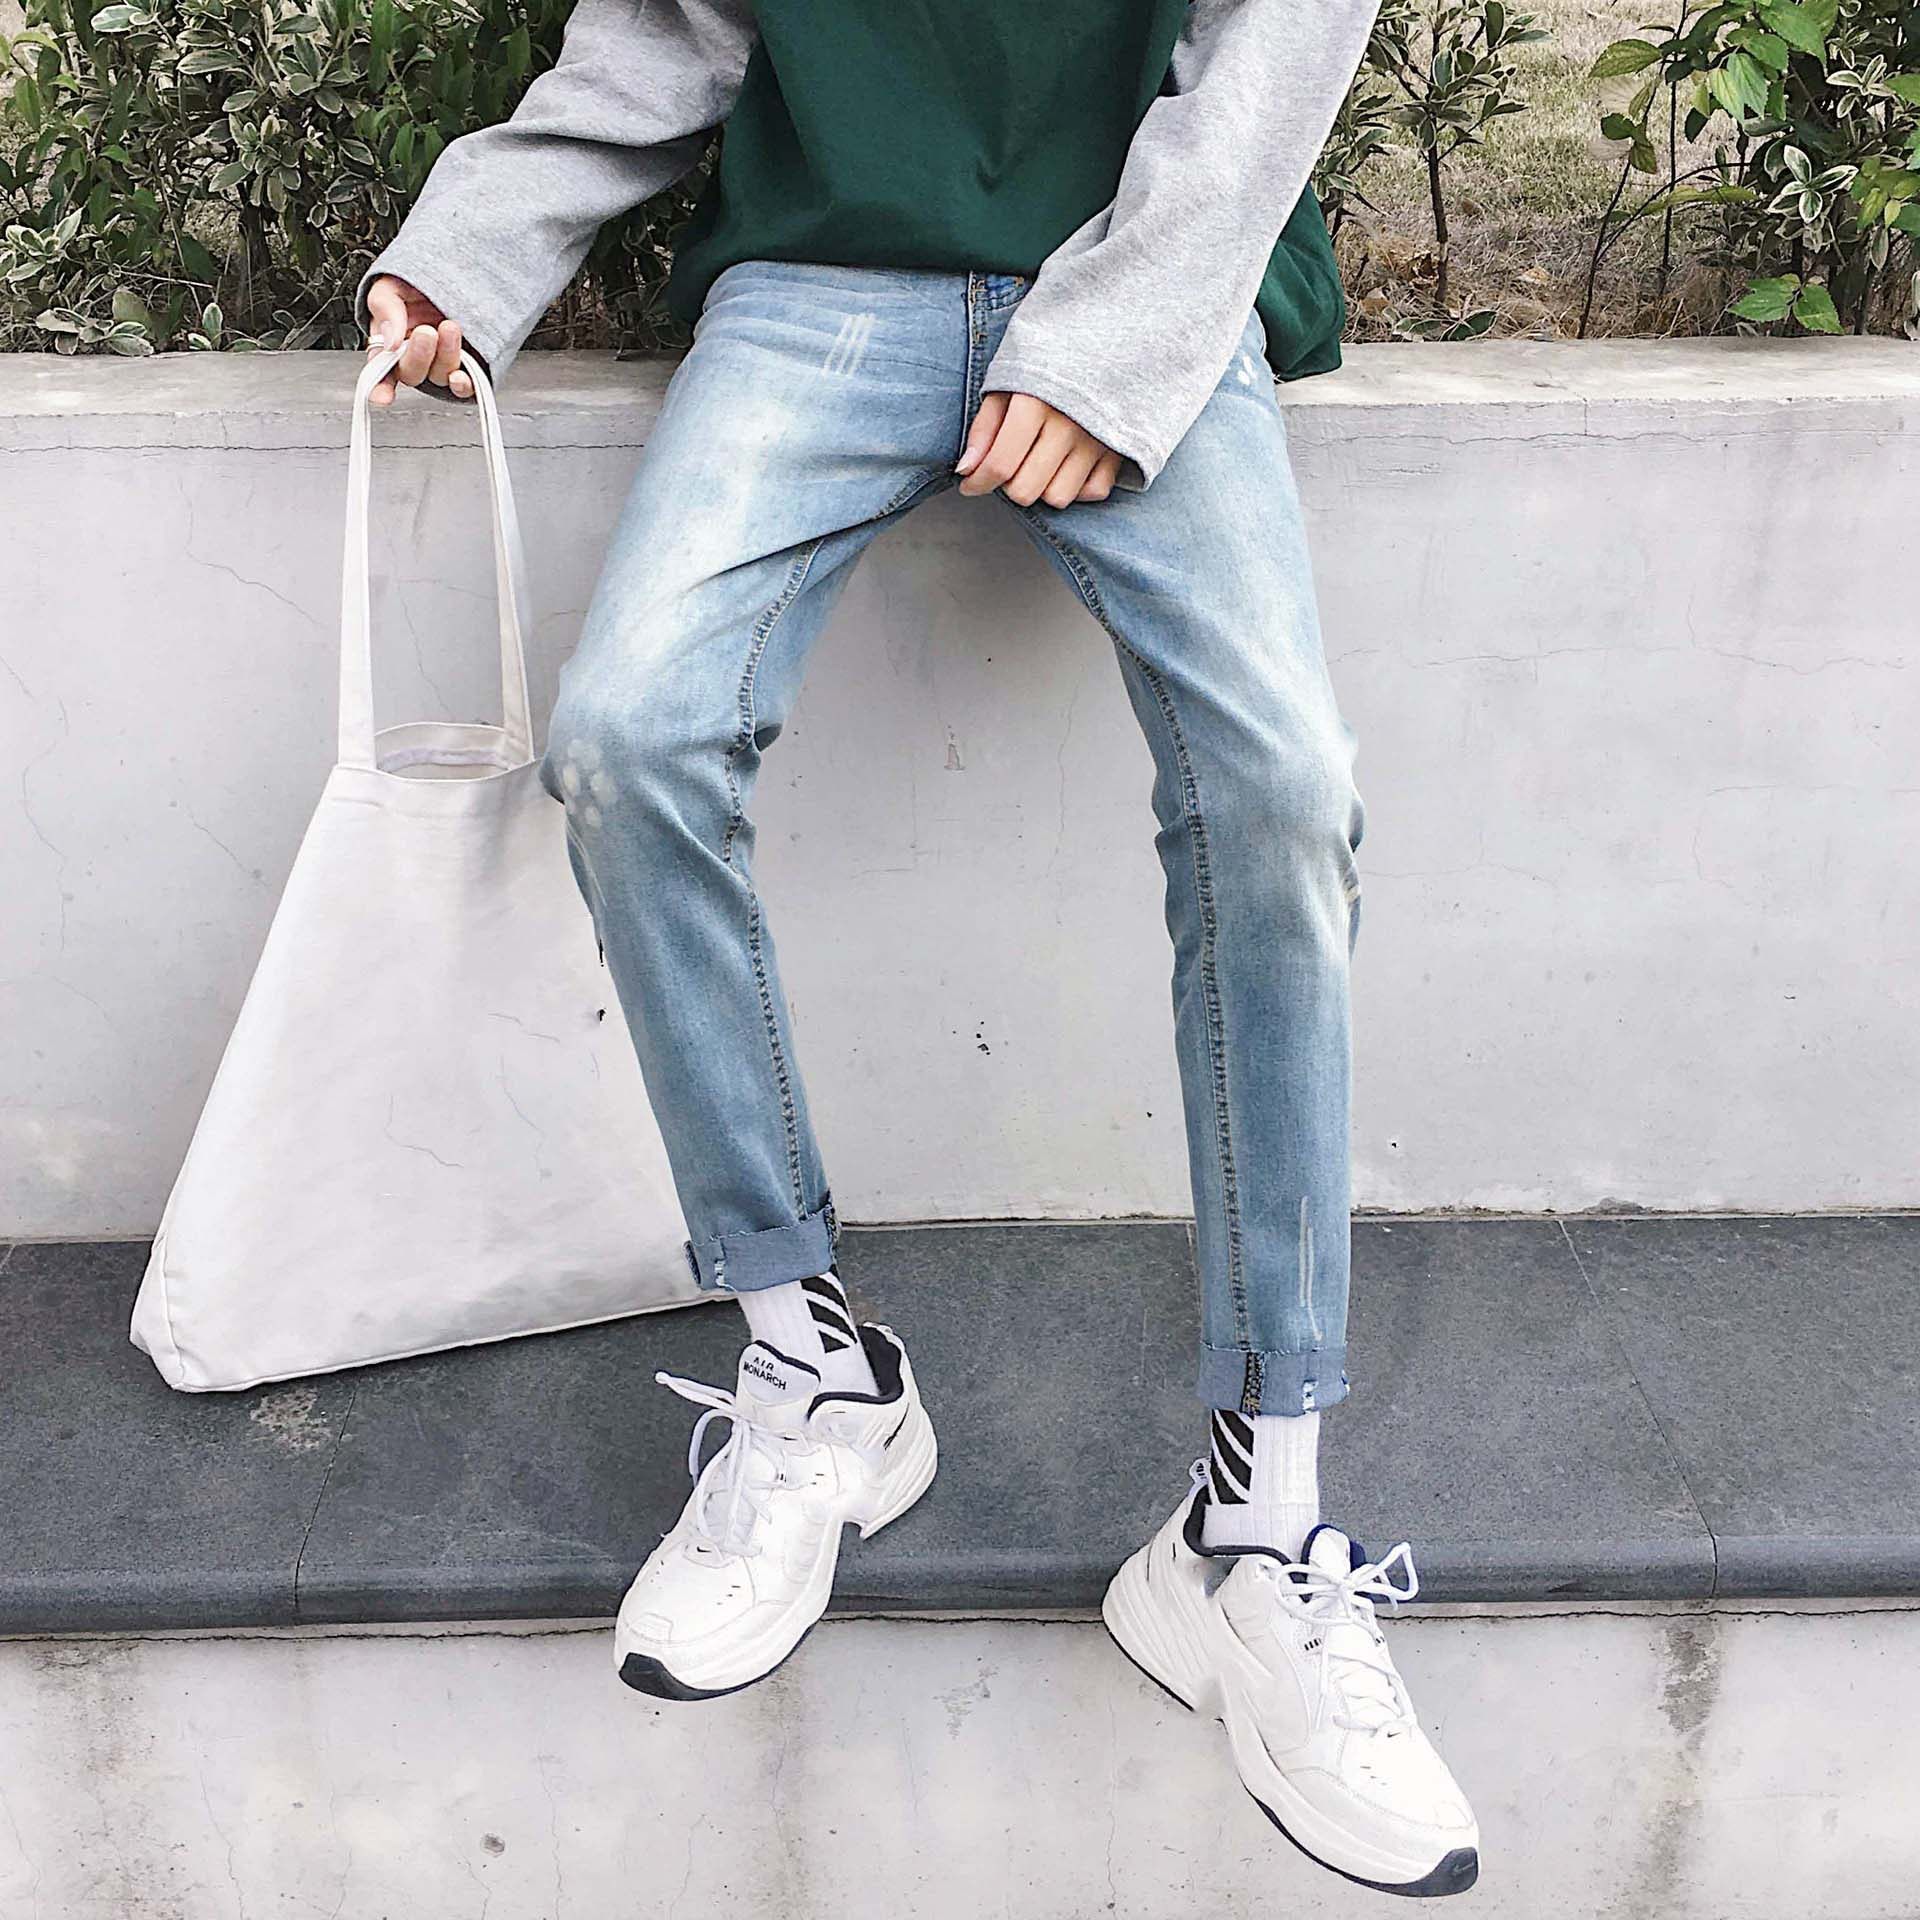 Wholesale 2019 Spring Autumn streetwear ripped biker slim fit jeans for men denim classic jeans homme slim pencil jeans men in Jeans from Men 39 s Clothing